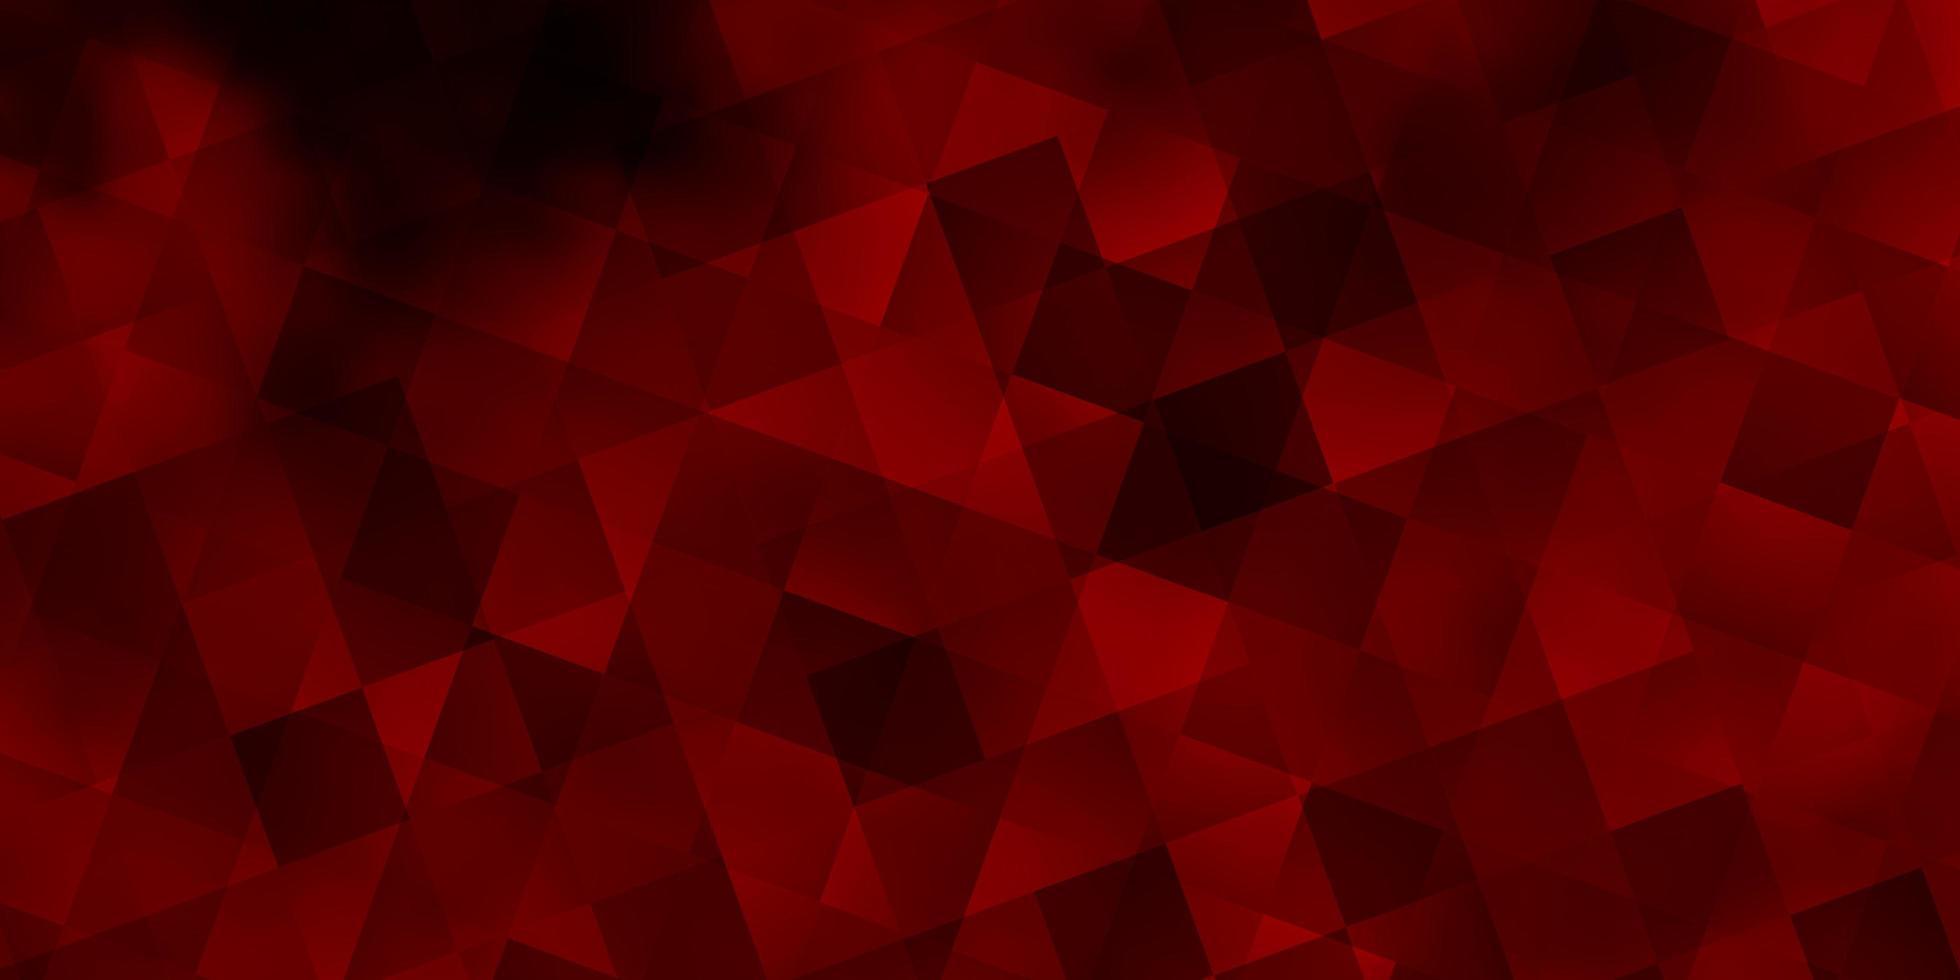 textura vector laranja claro com estilo poli com cubos.